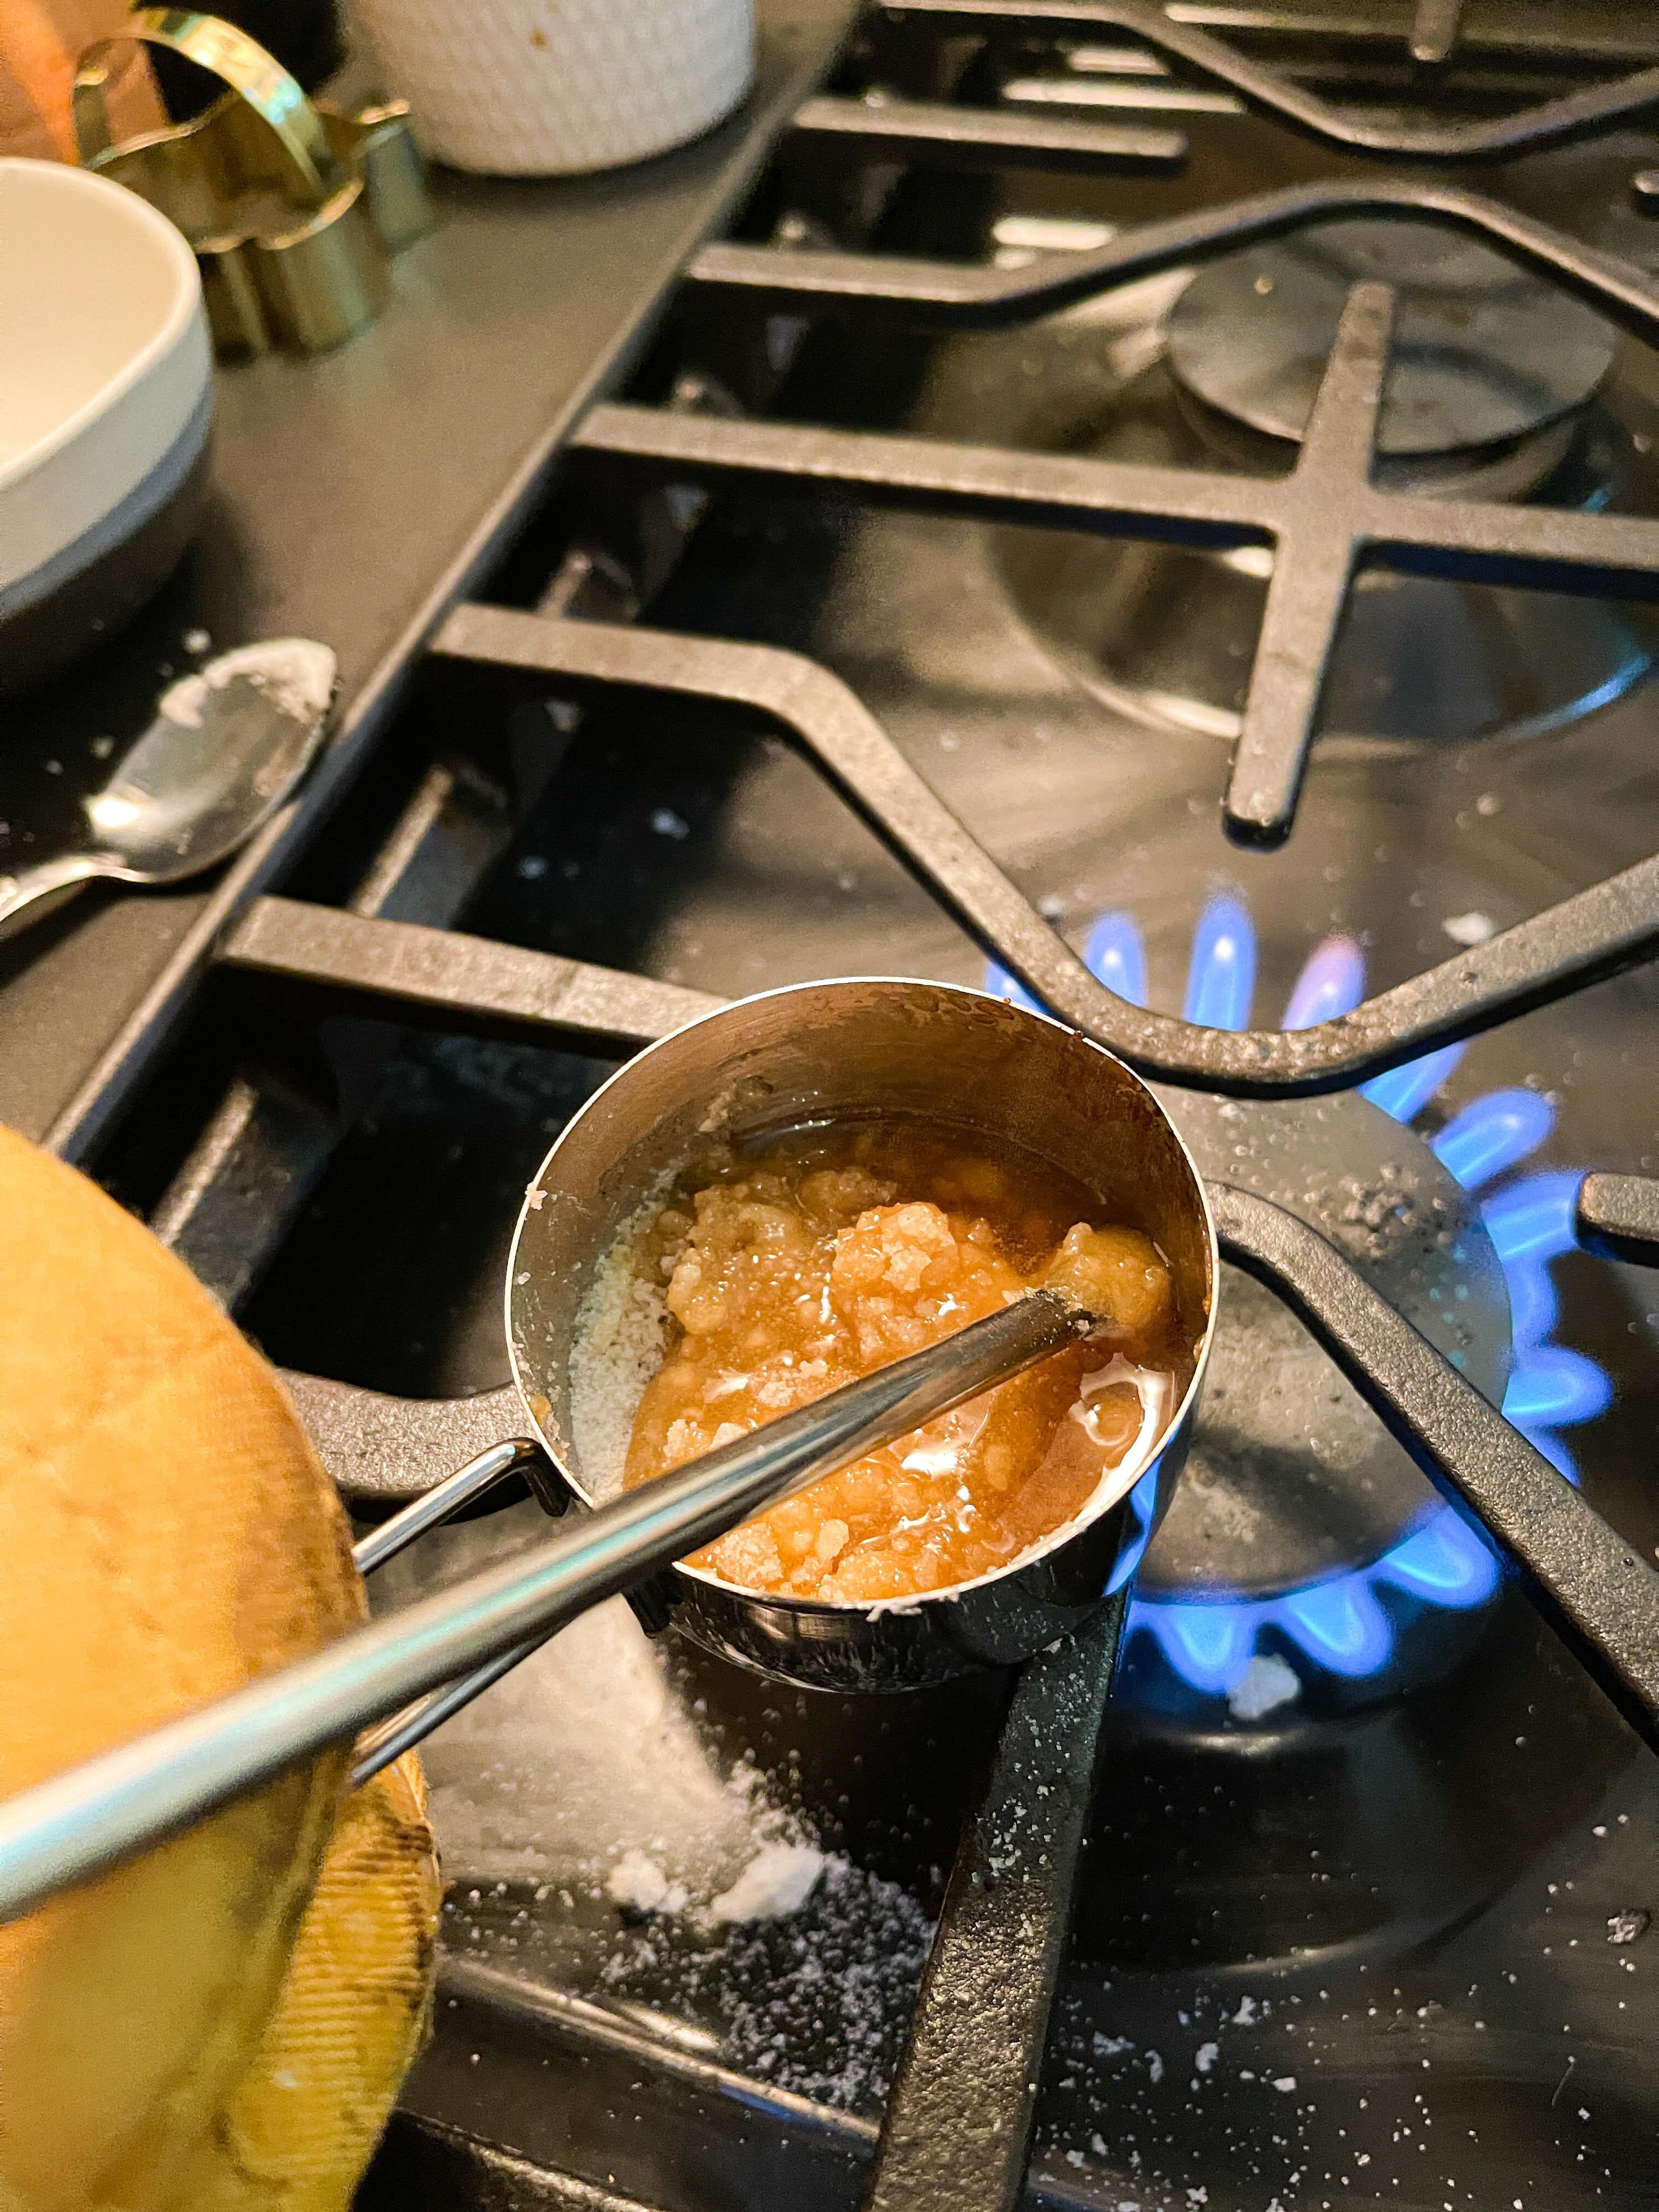 Sugar cooking in metal measuring cup; beginning to caramelize